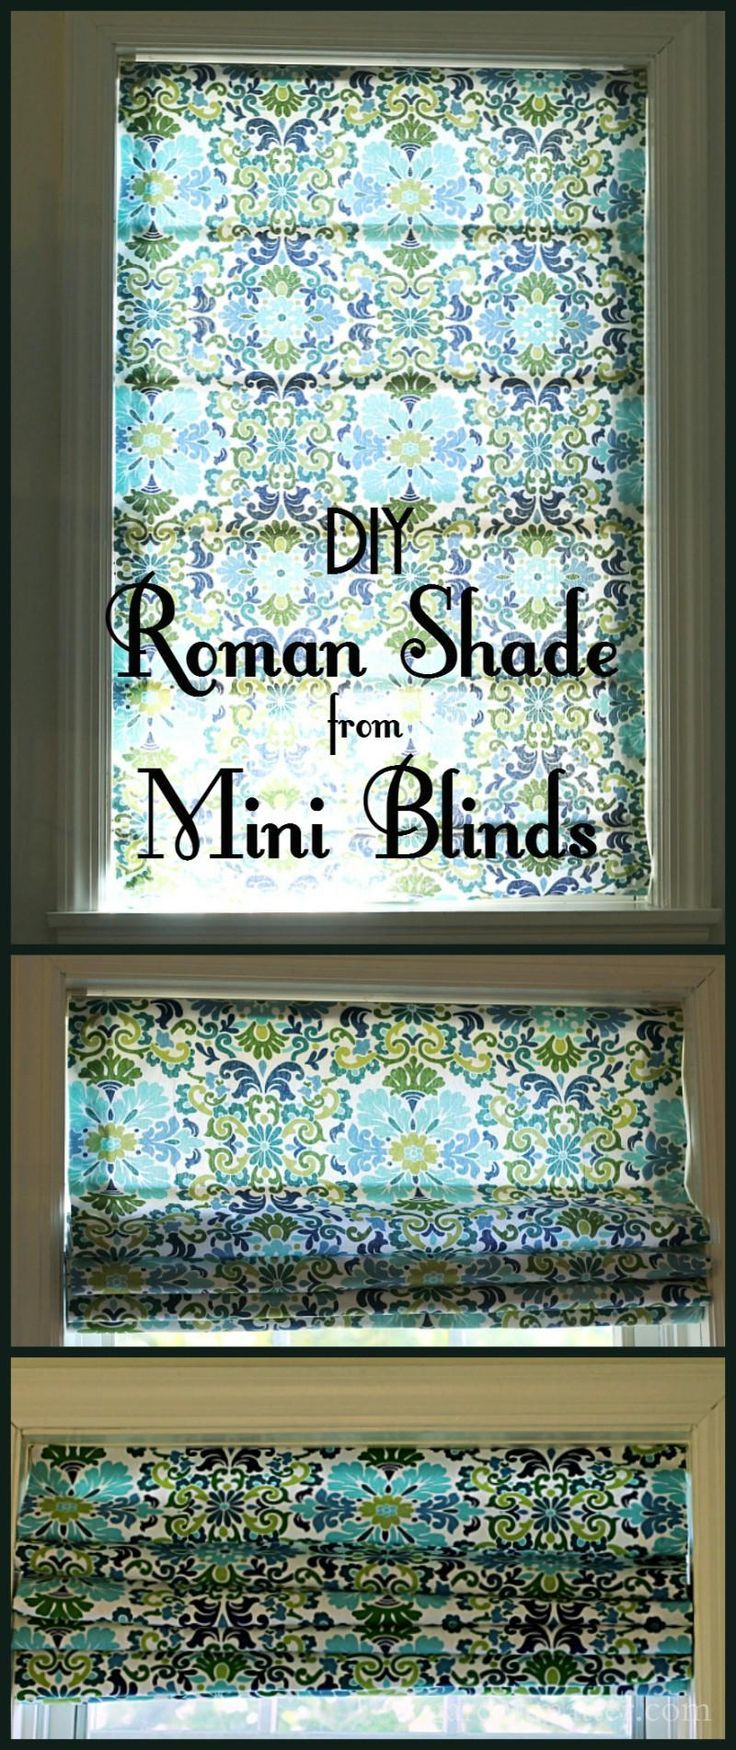 Diy roman shade from mini blinds mini blinds roman and tutorials diy roman shade from mini blinds solutioingenieria Images